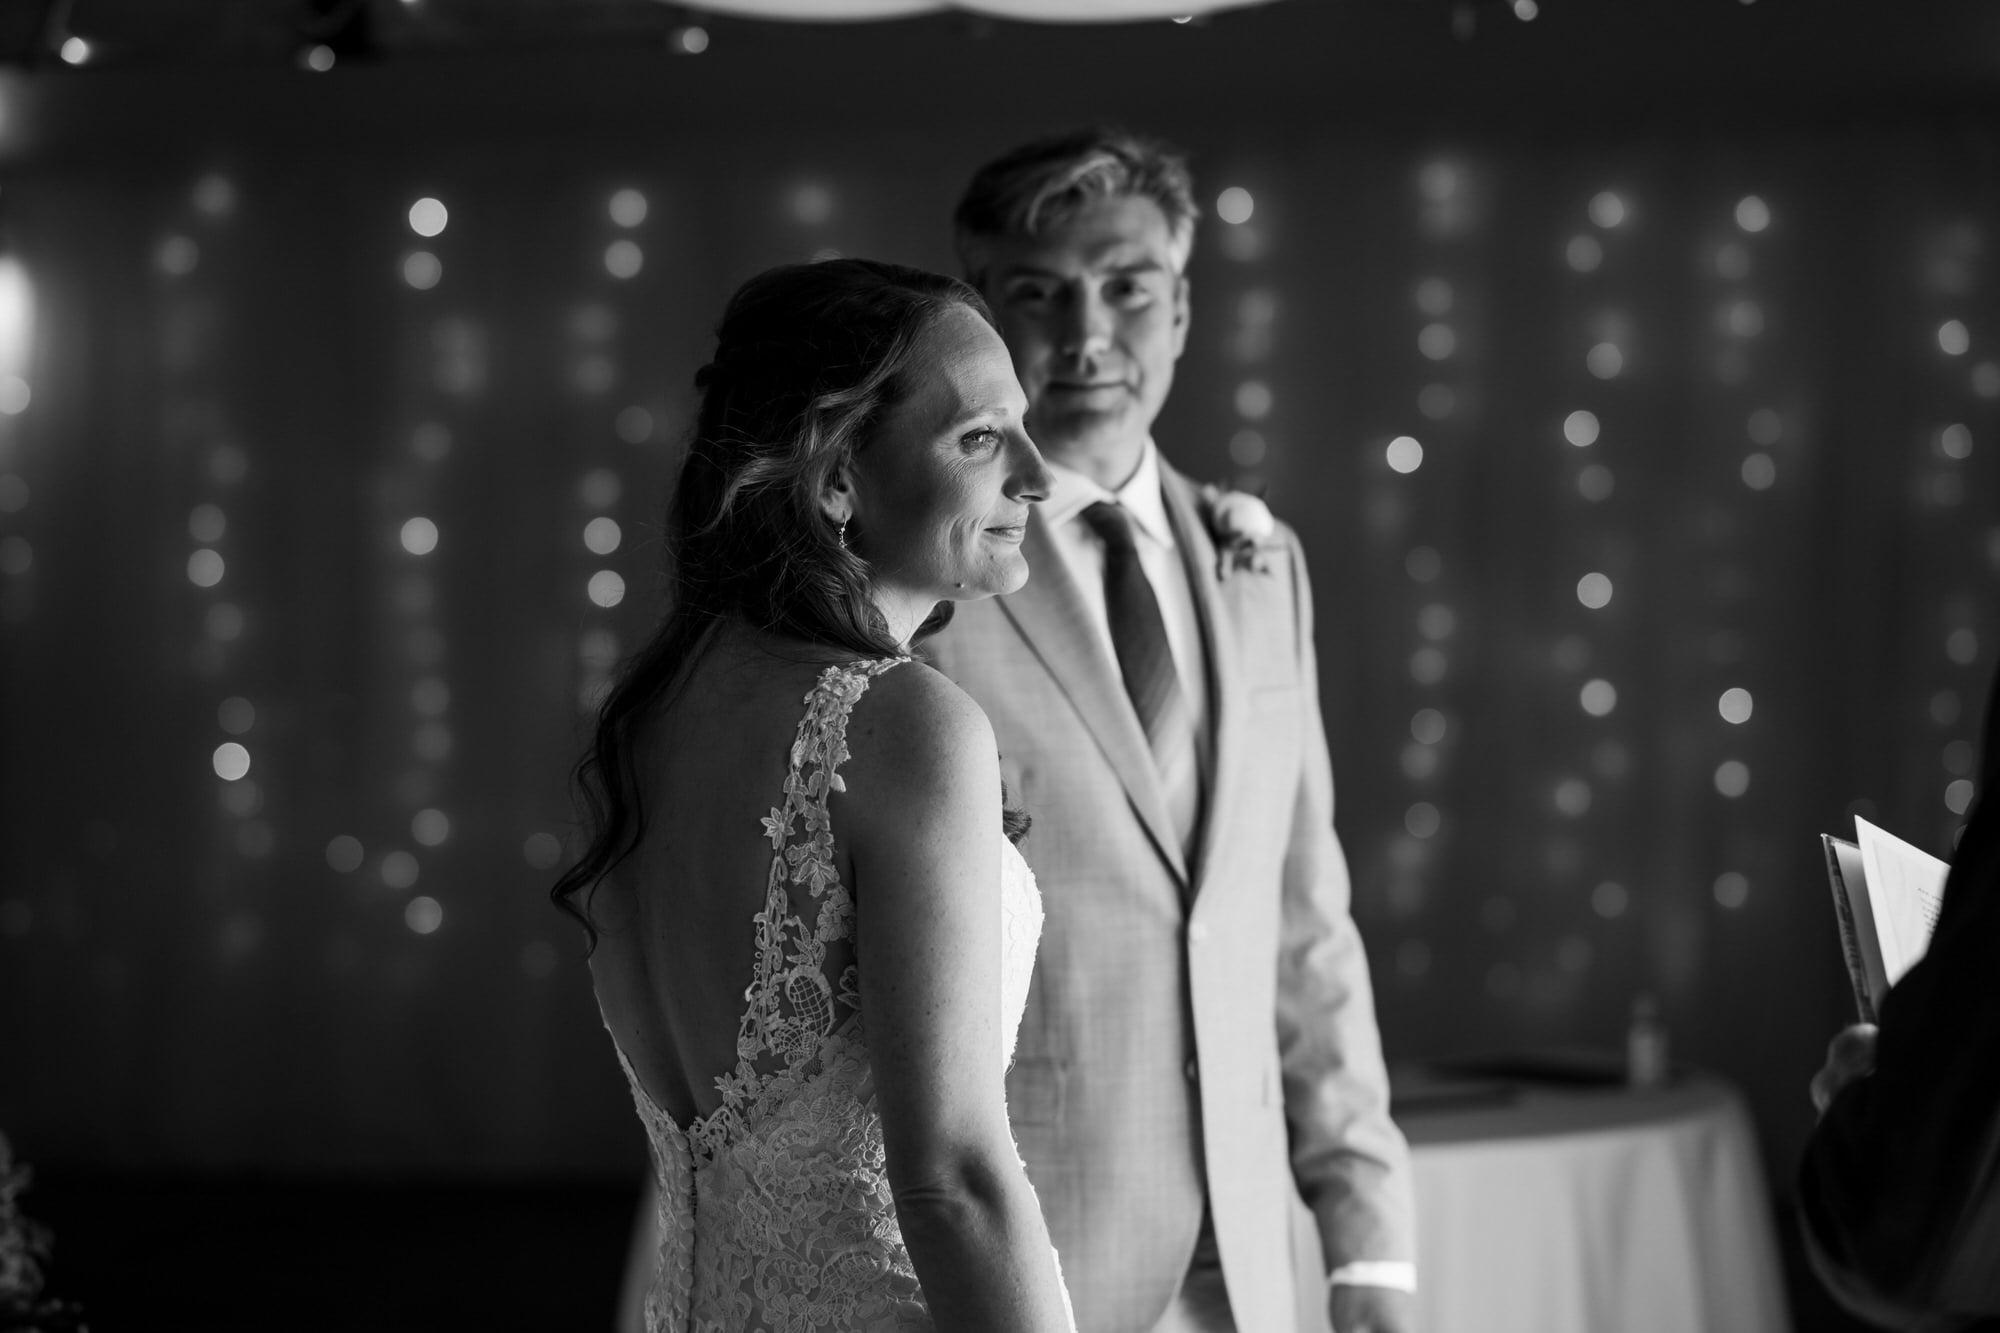 Farbridge Barn Wedding Photography by Chichester Wedding Photographer